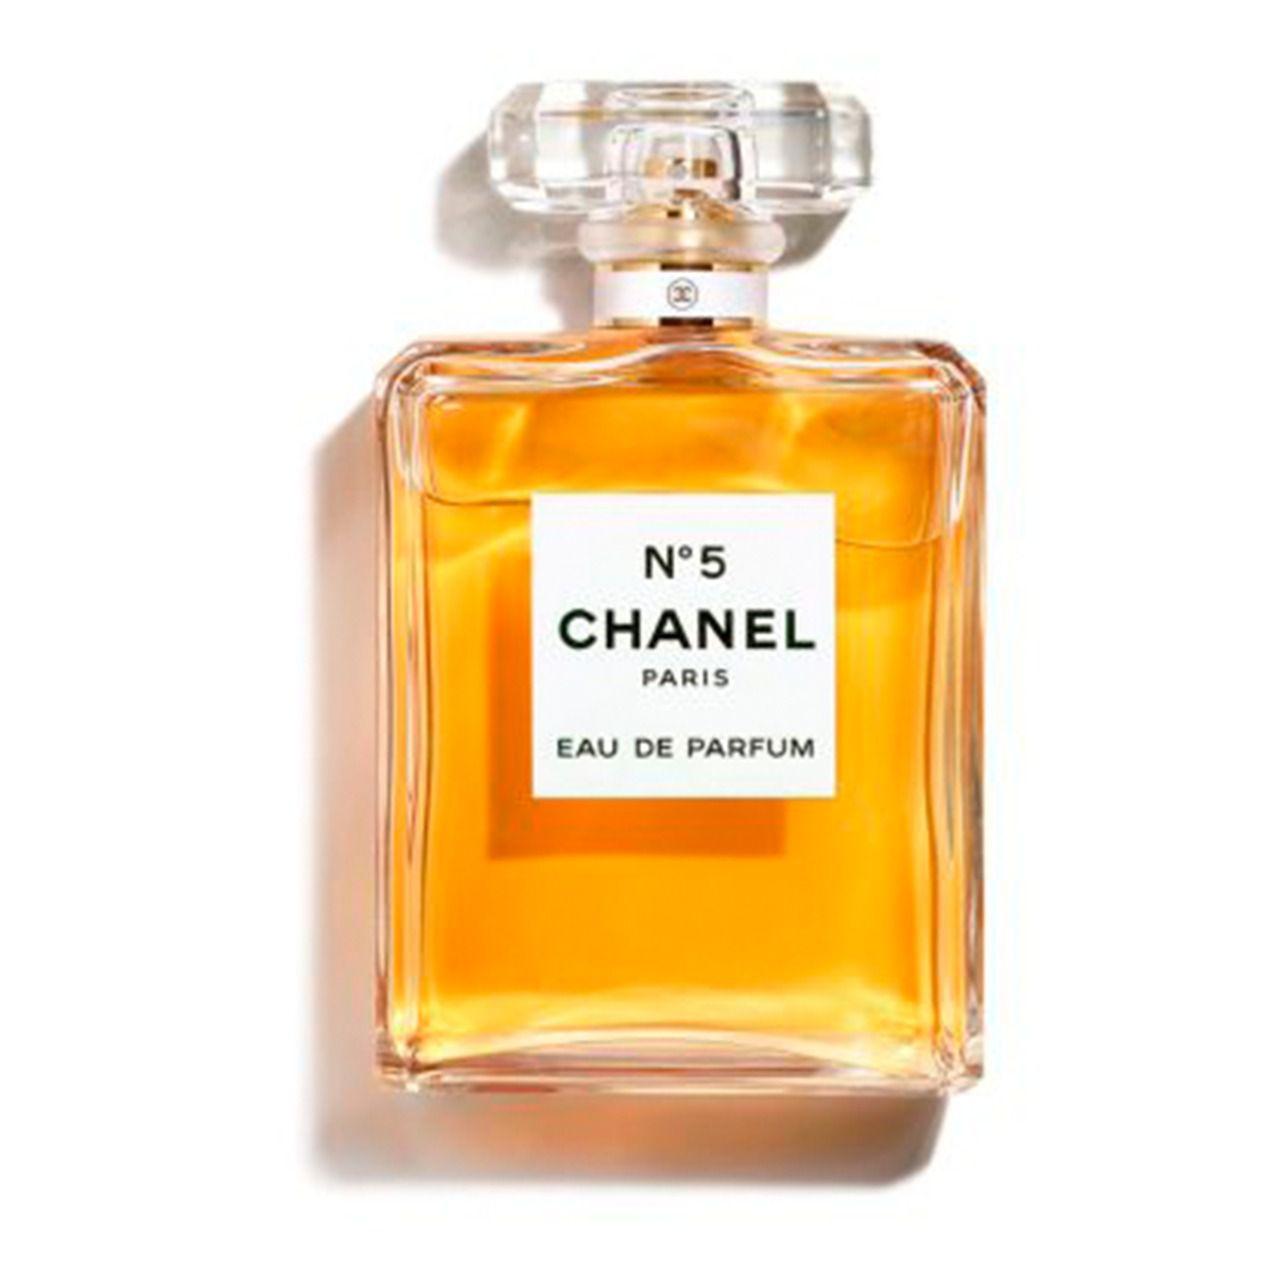 N°5 Chanel Eau de Parfum Perfume Feminino